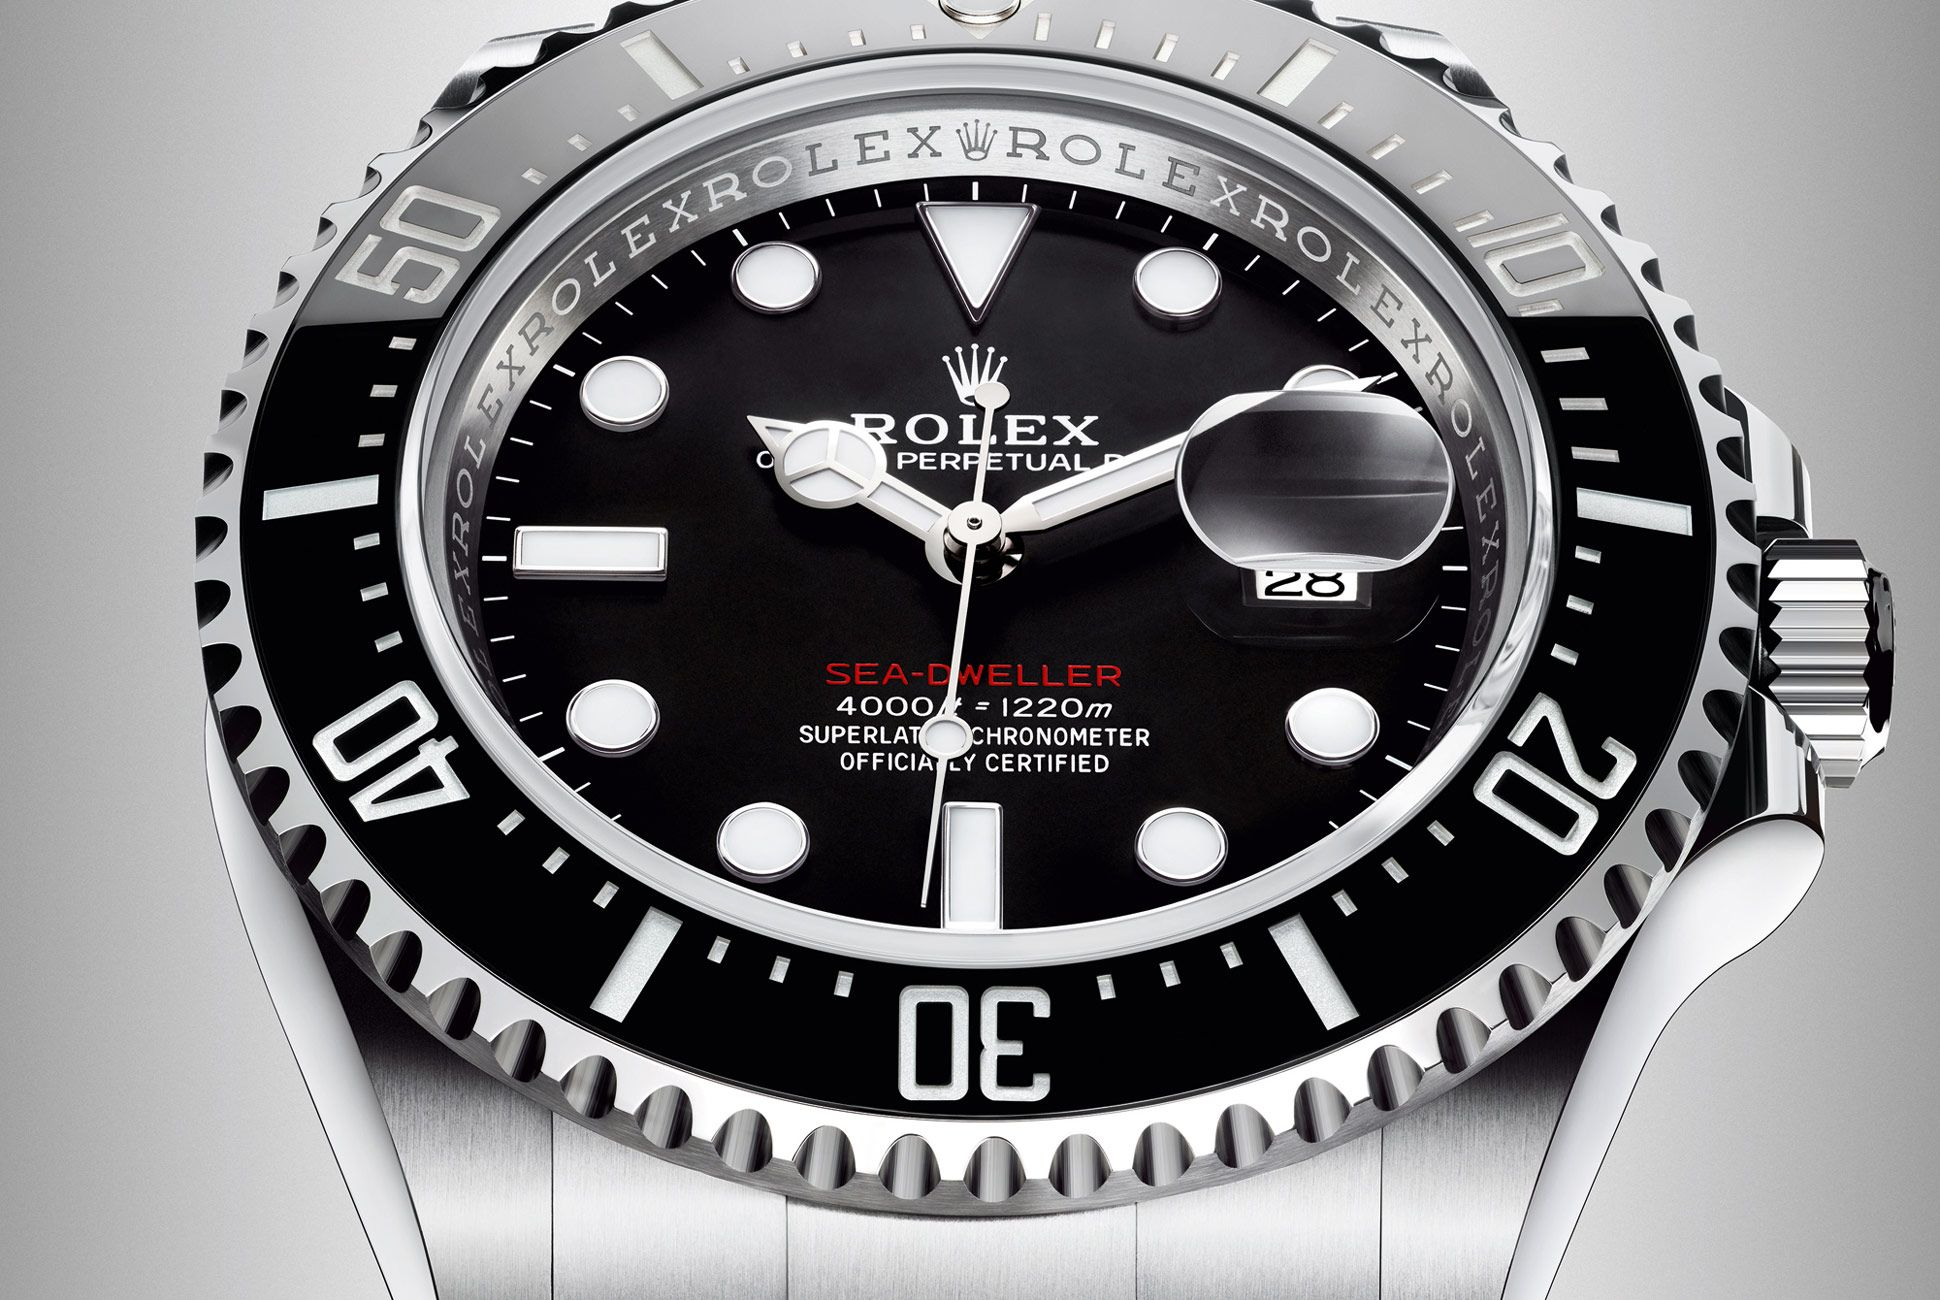 Rolex-Sea-Dweller-Gear-Patrol-Slide-1